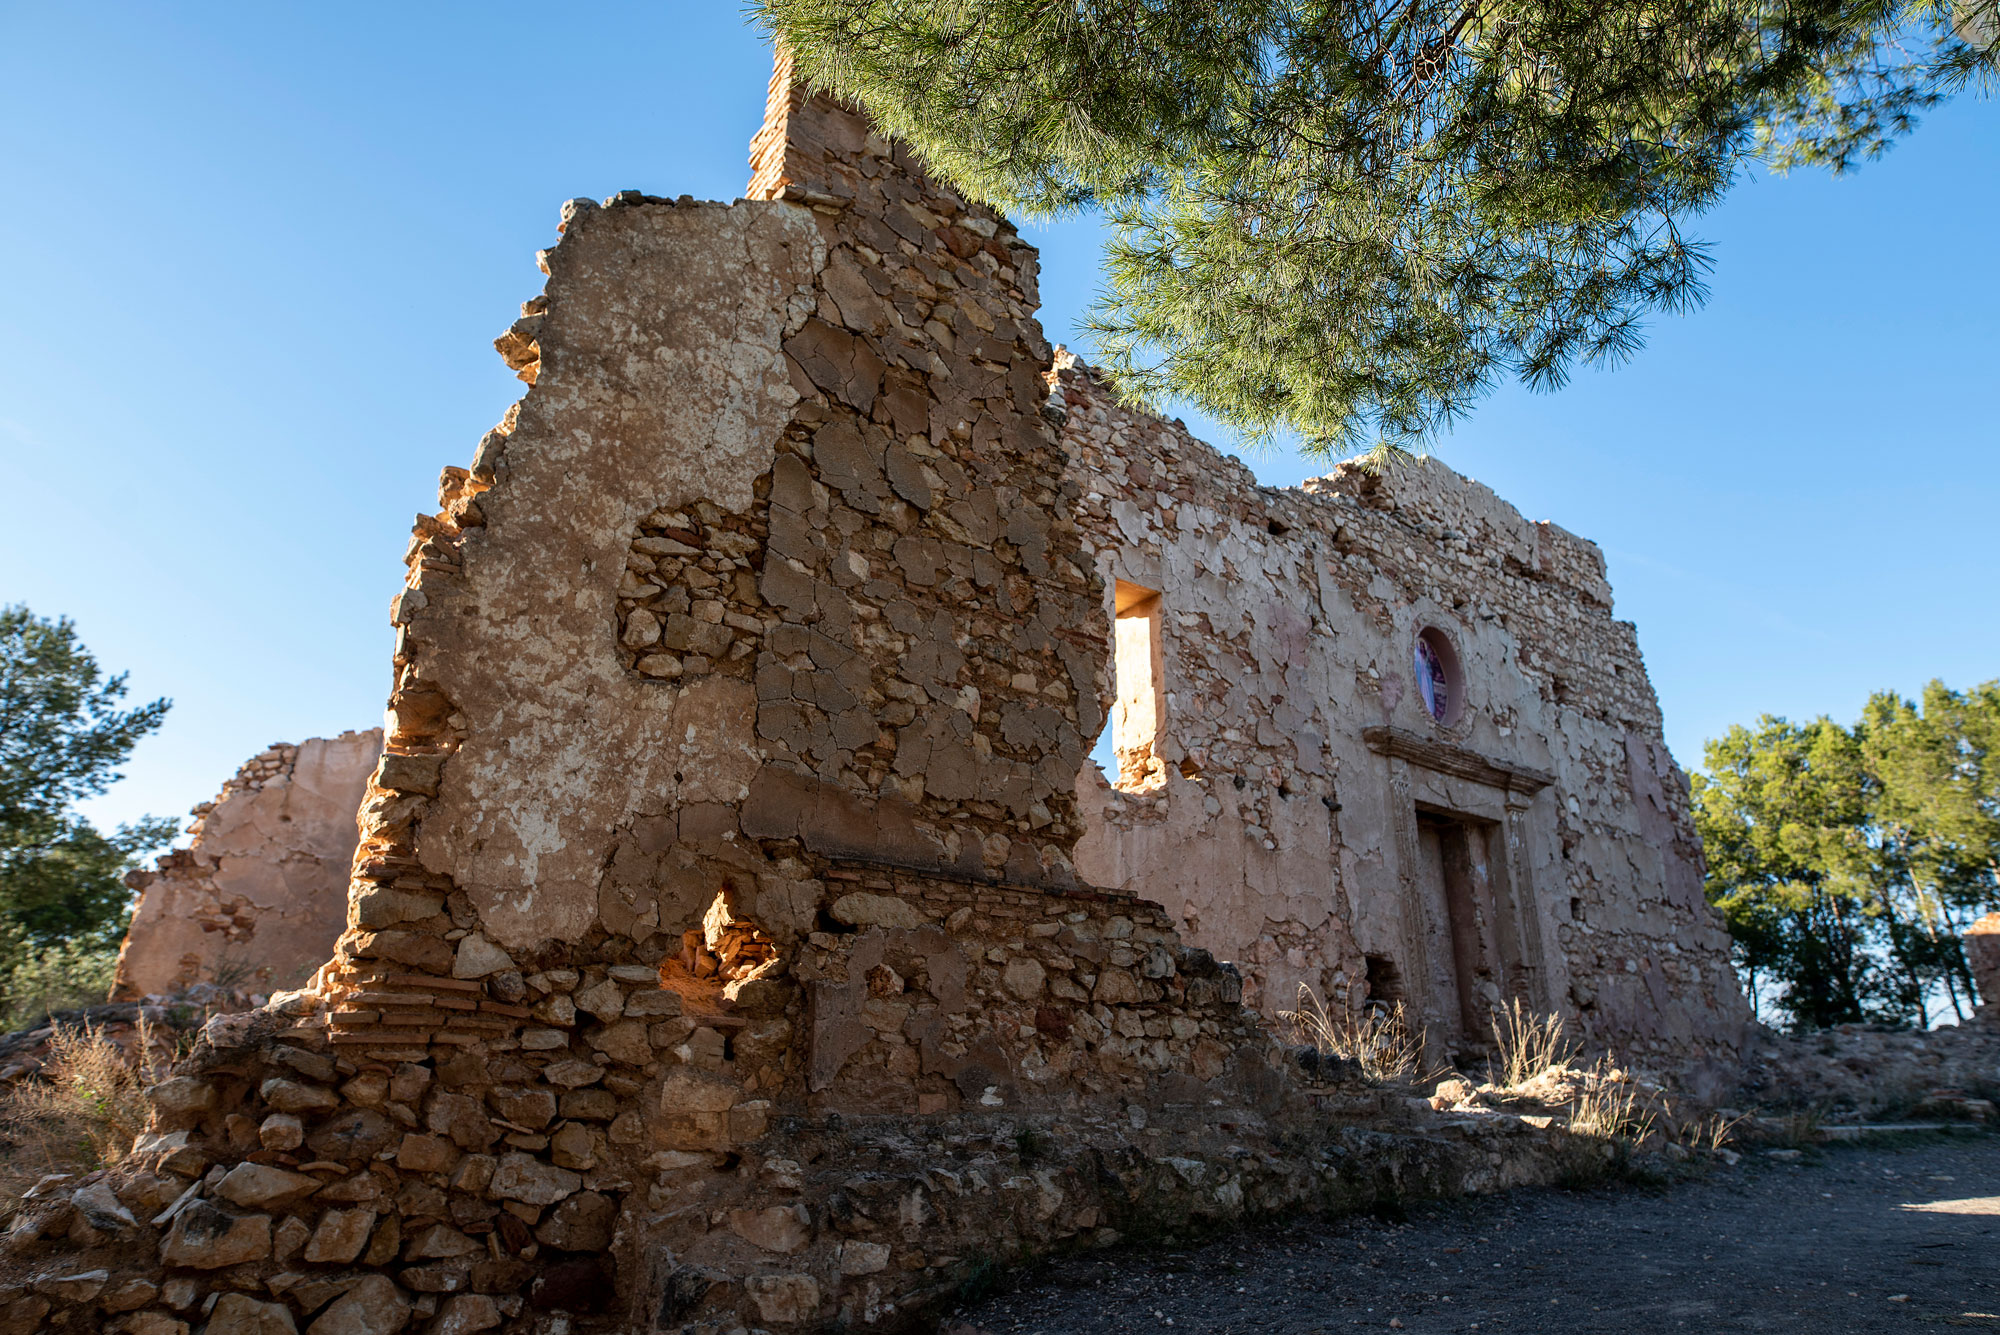 Turisme Llíria Ermita de Santa Bàrbara